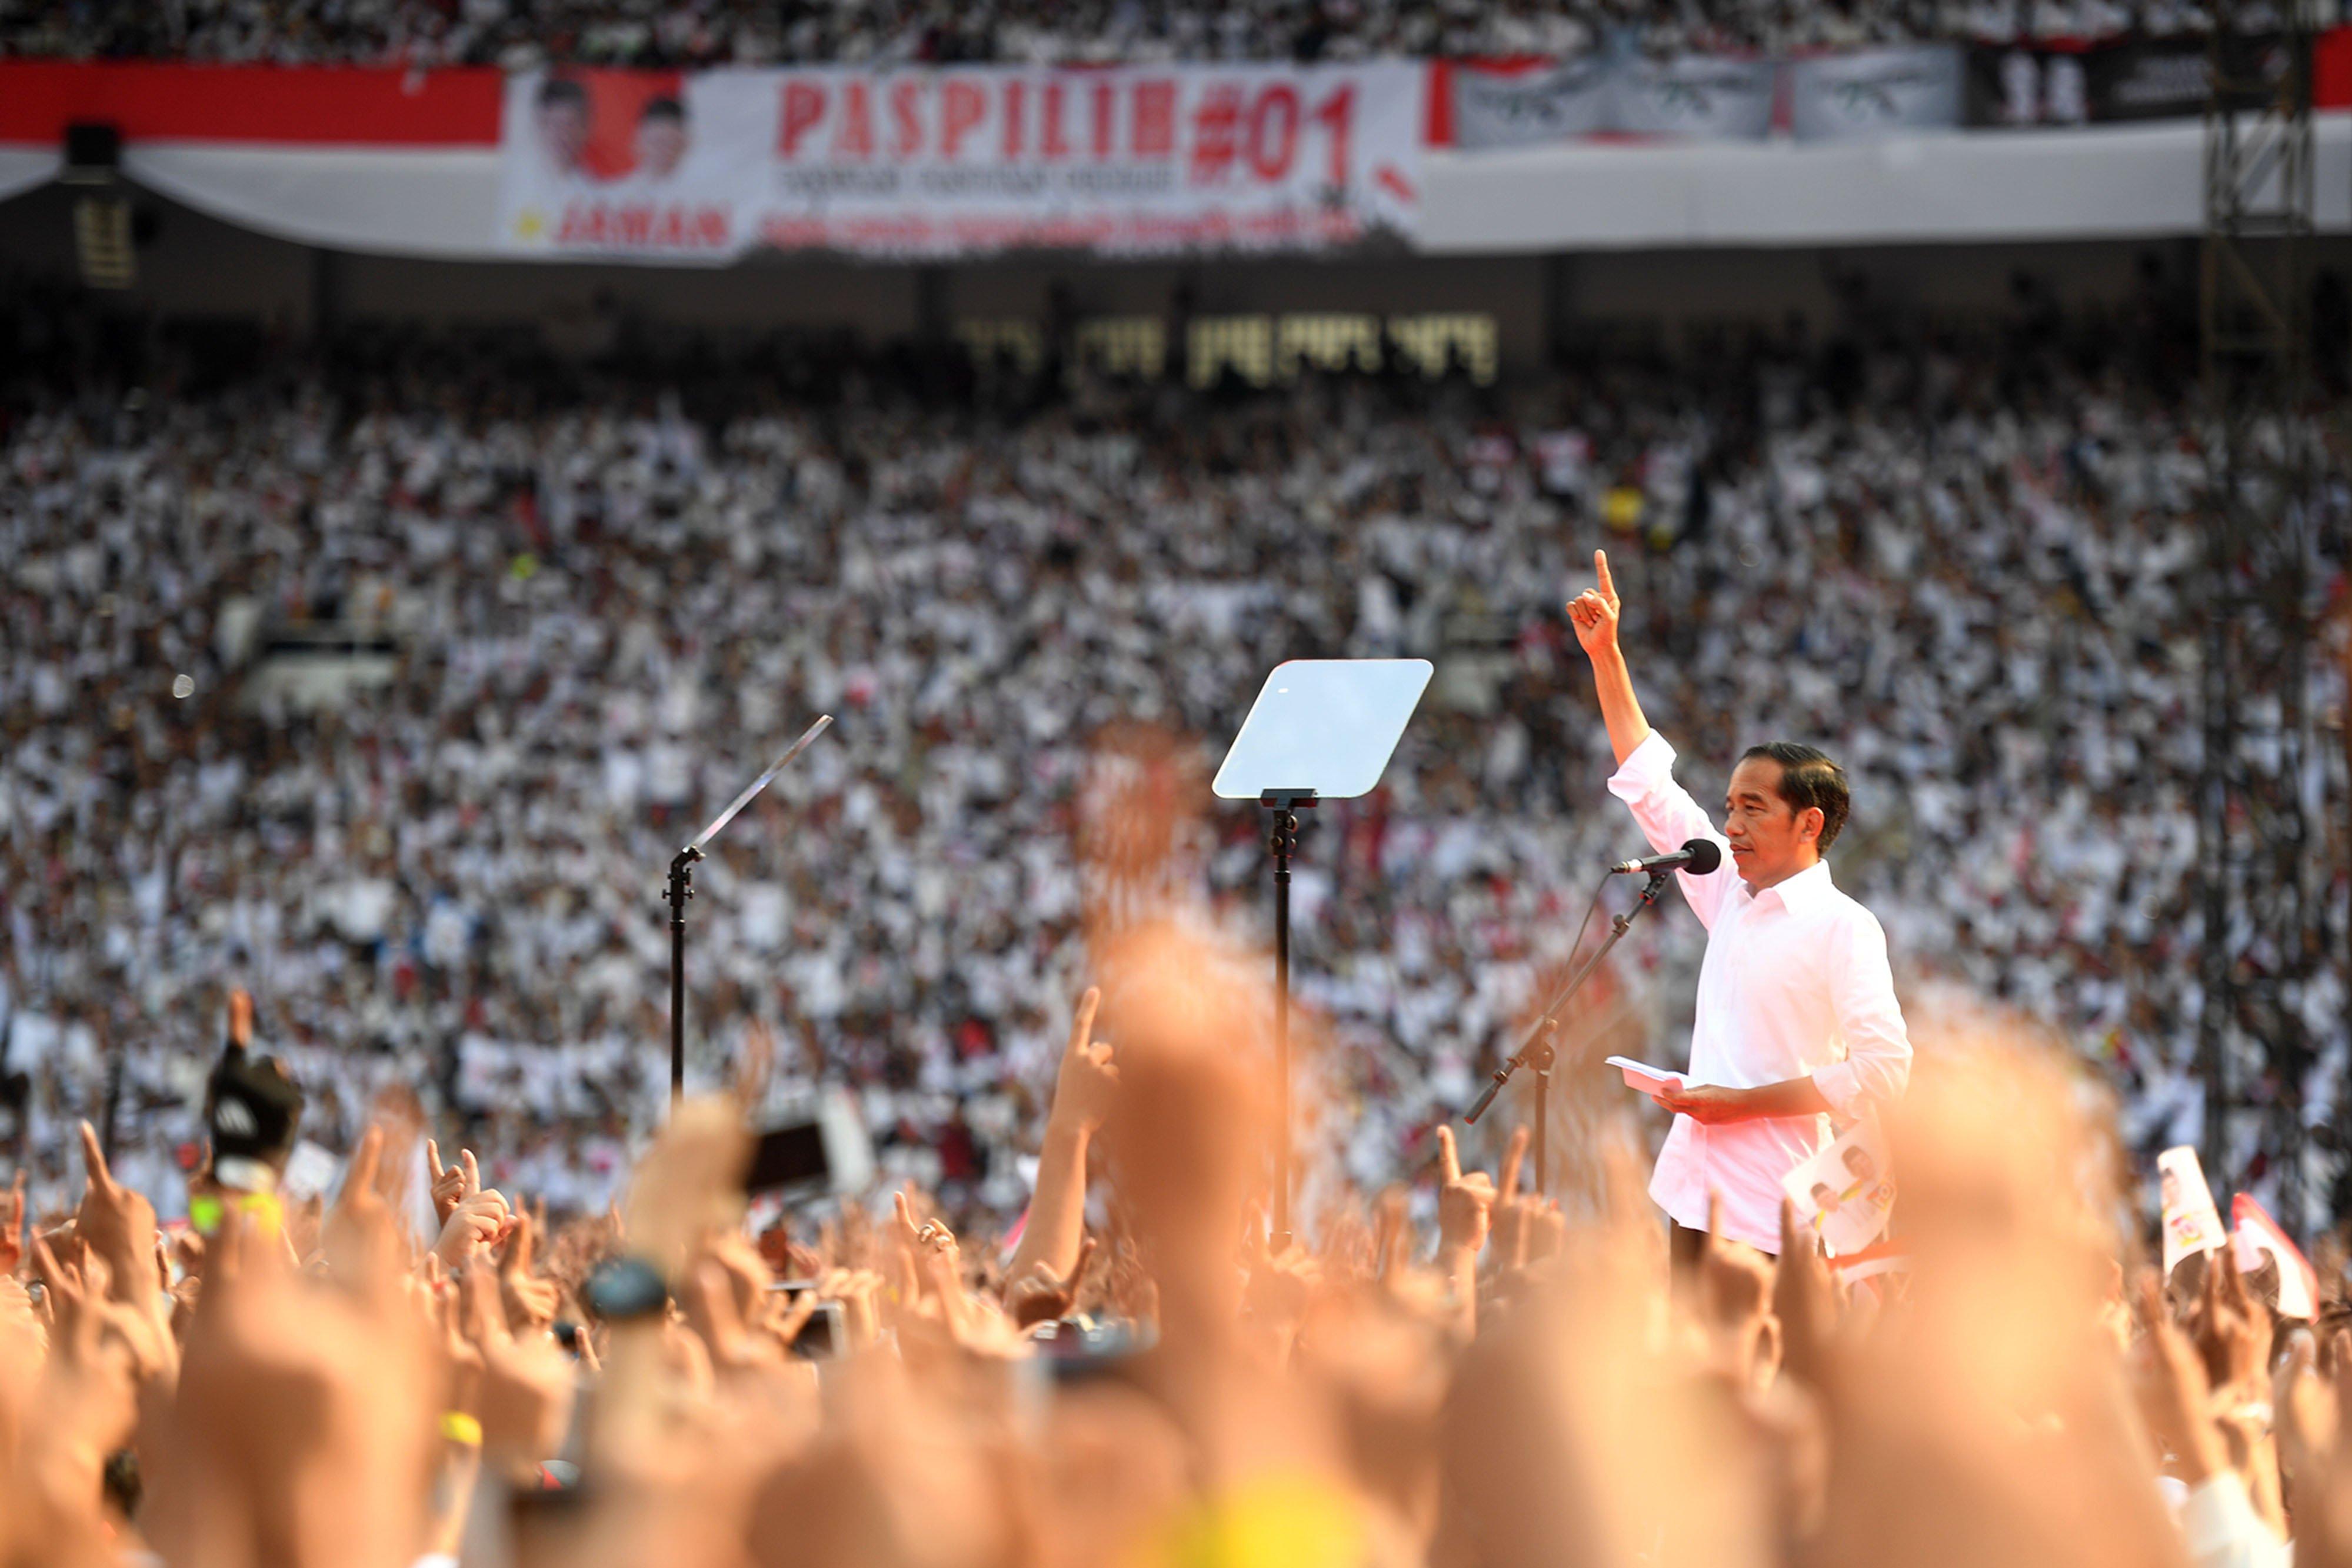 Pidato Calon Presiden Joko Widodo di GBK